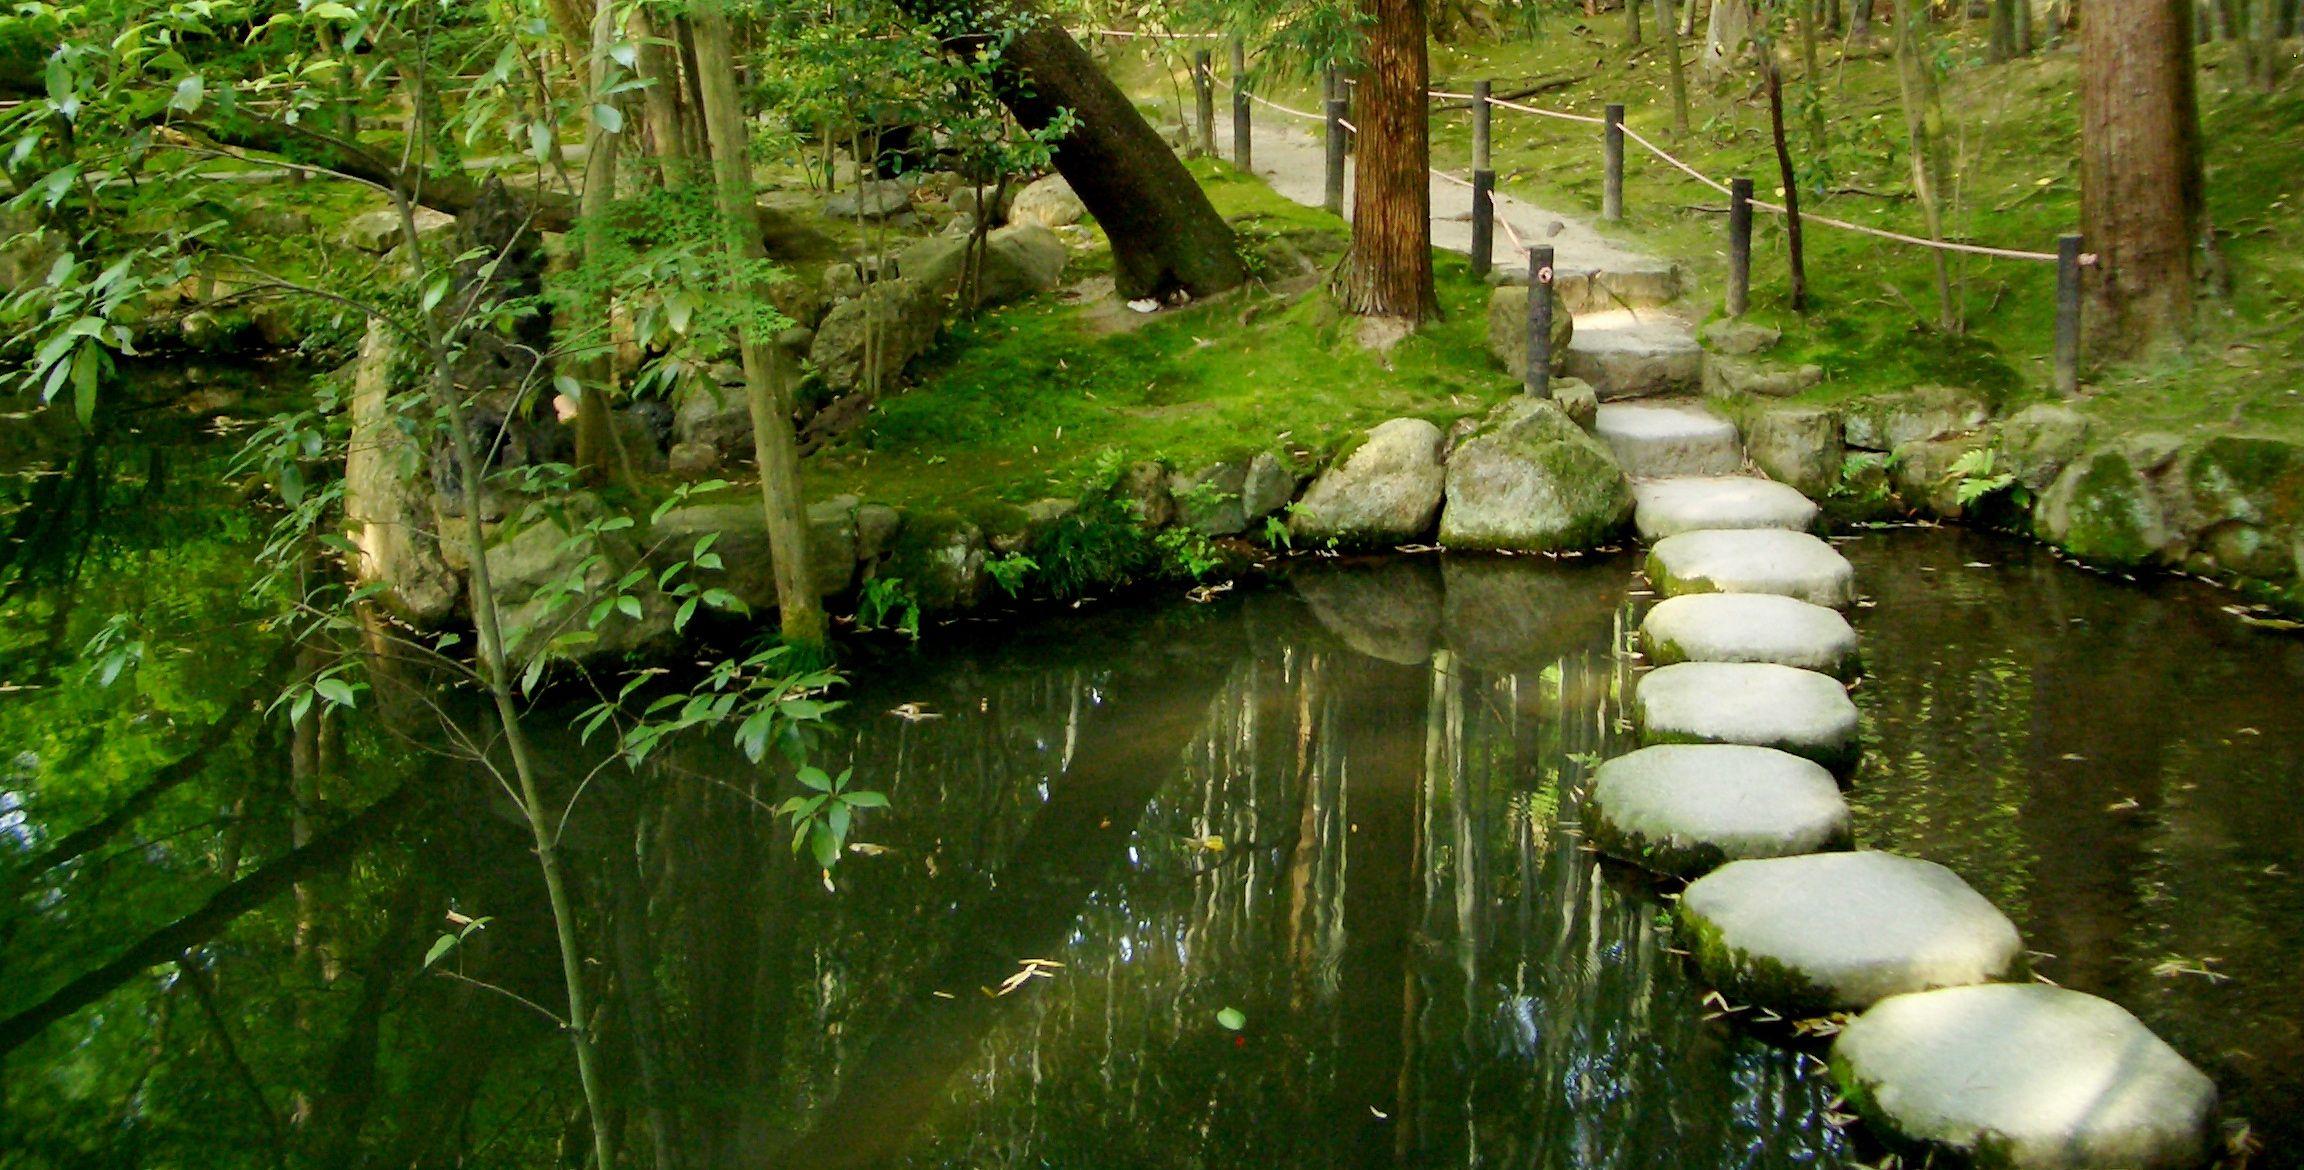 Japanese Water Garden | Japanese Water Garden